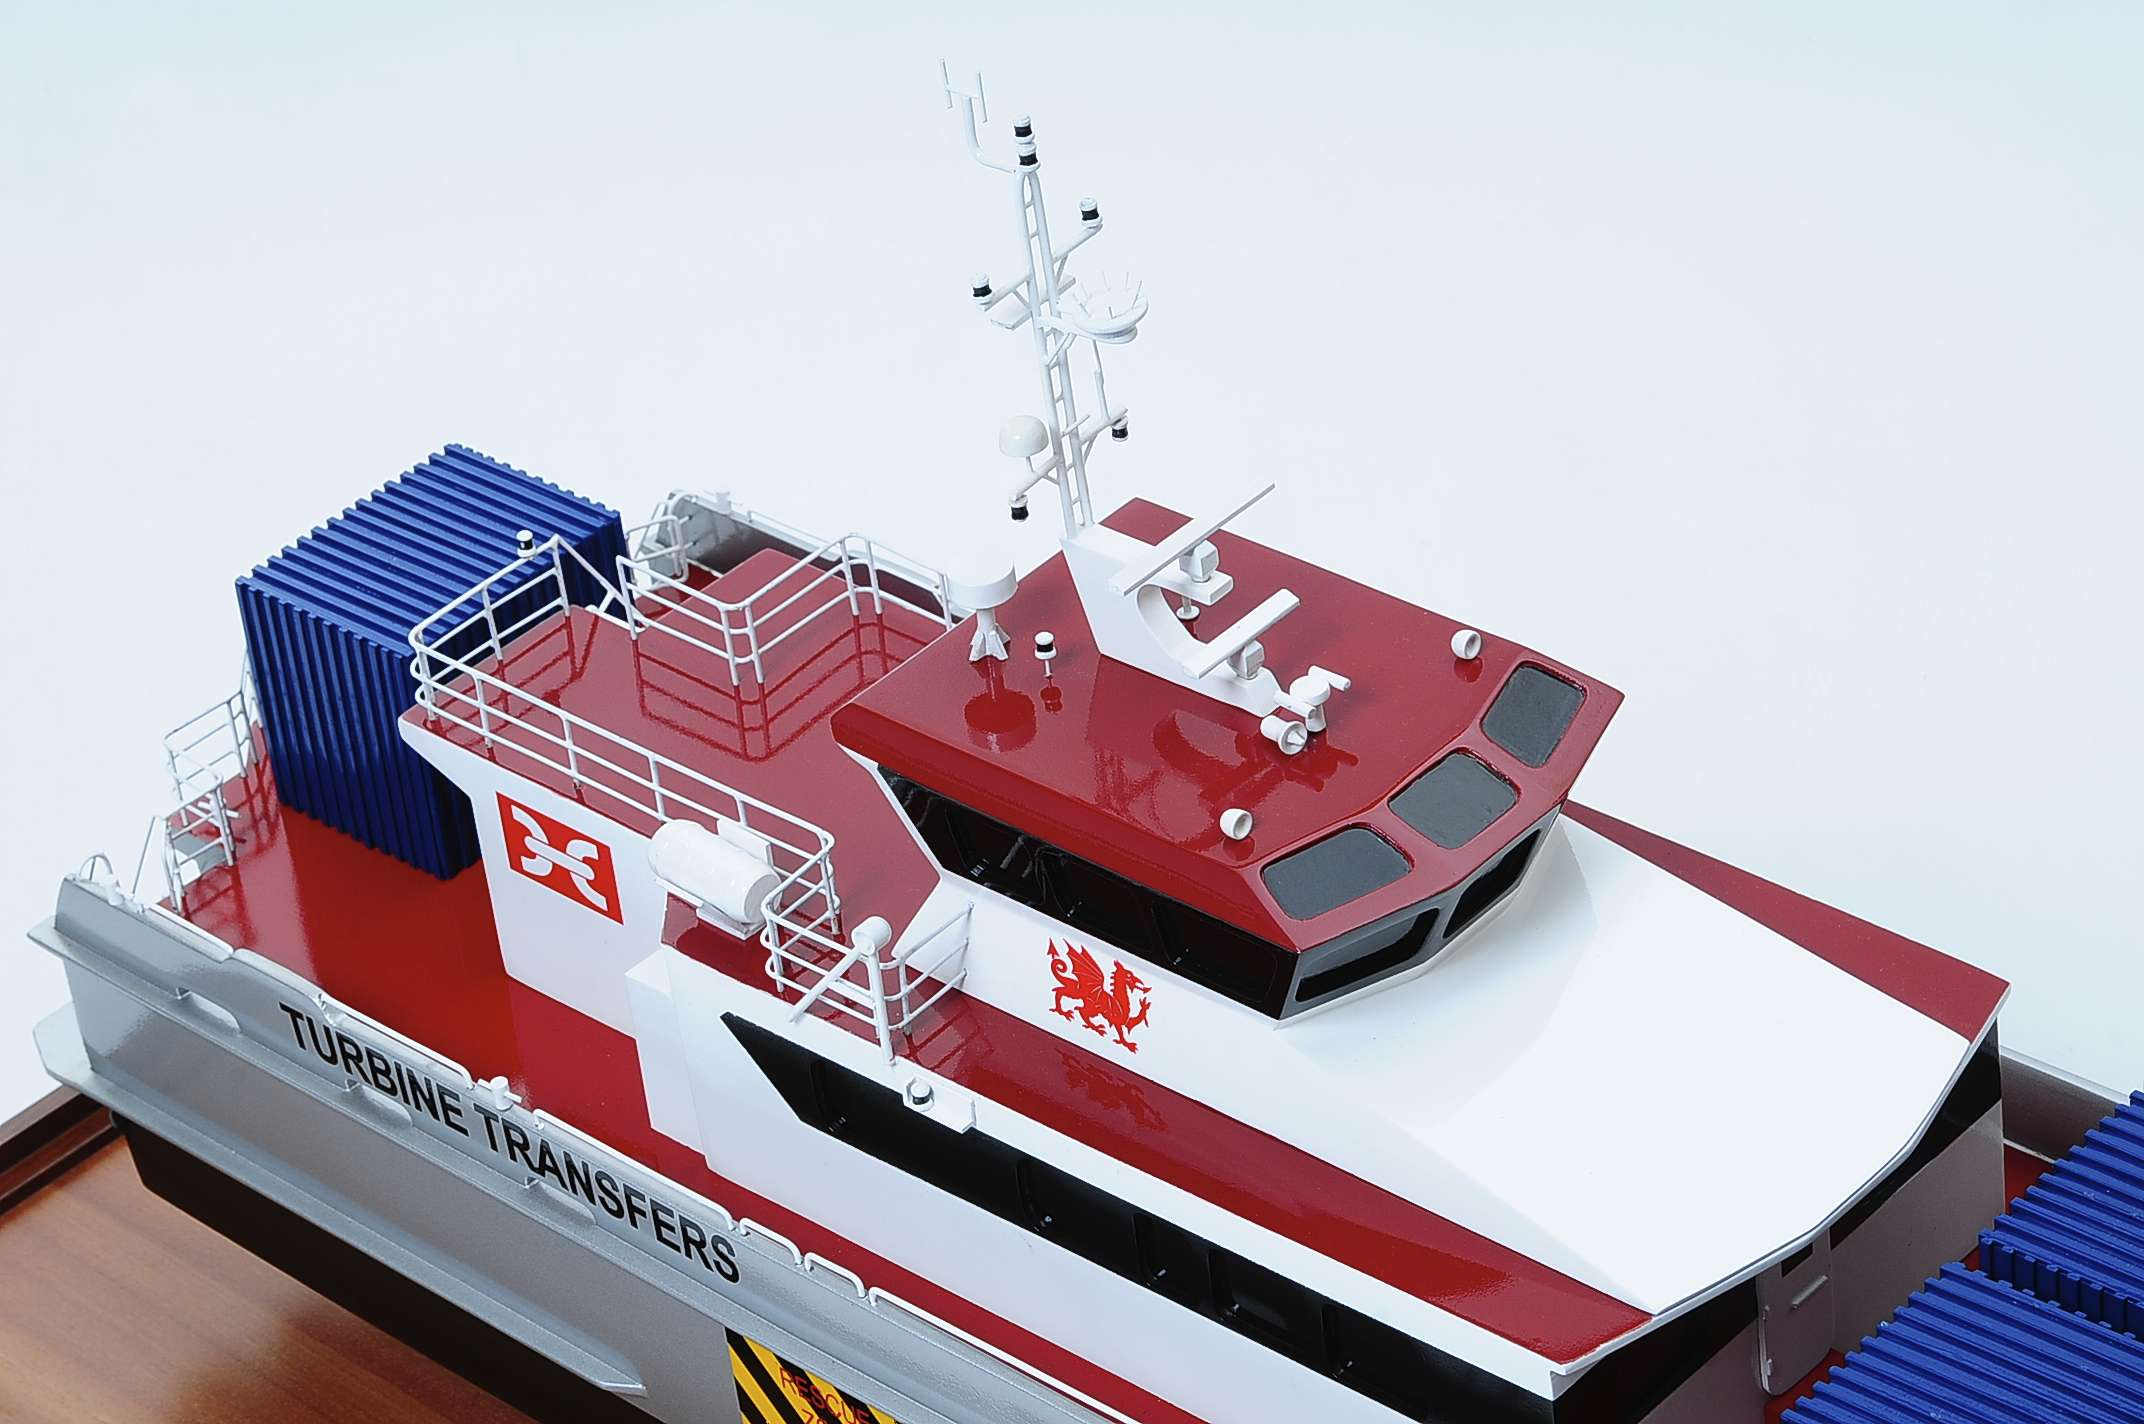 1439-4932-Turbine-Transfer-Catamaran-Model